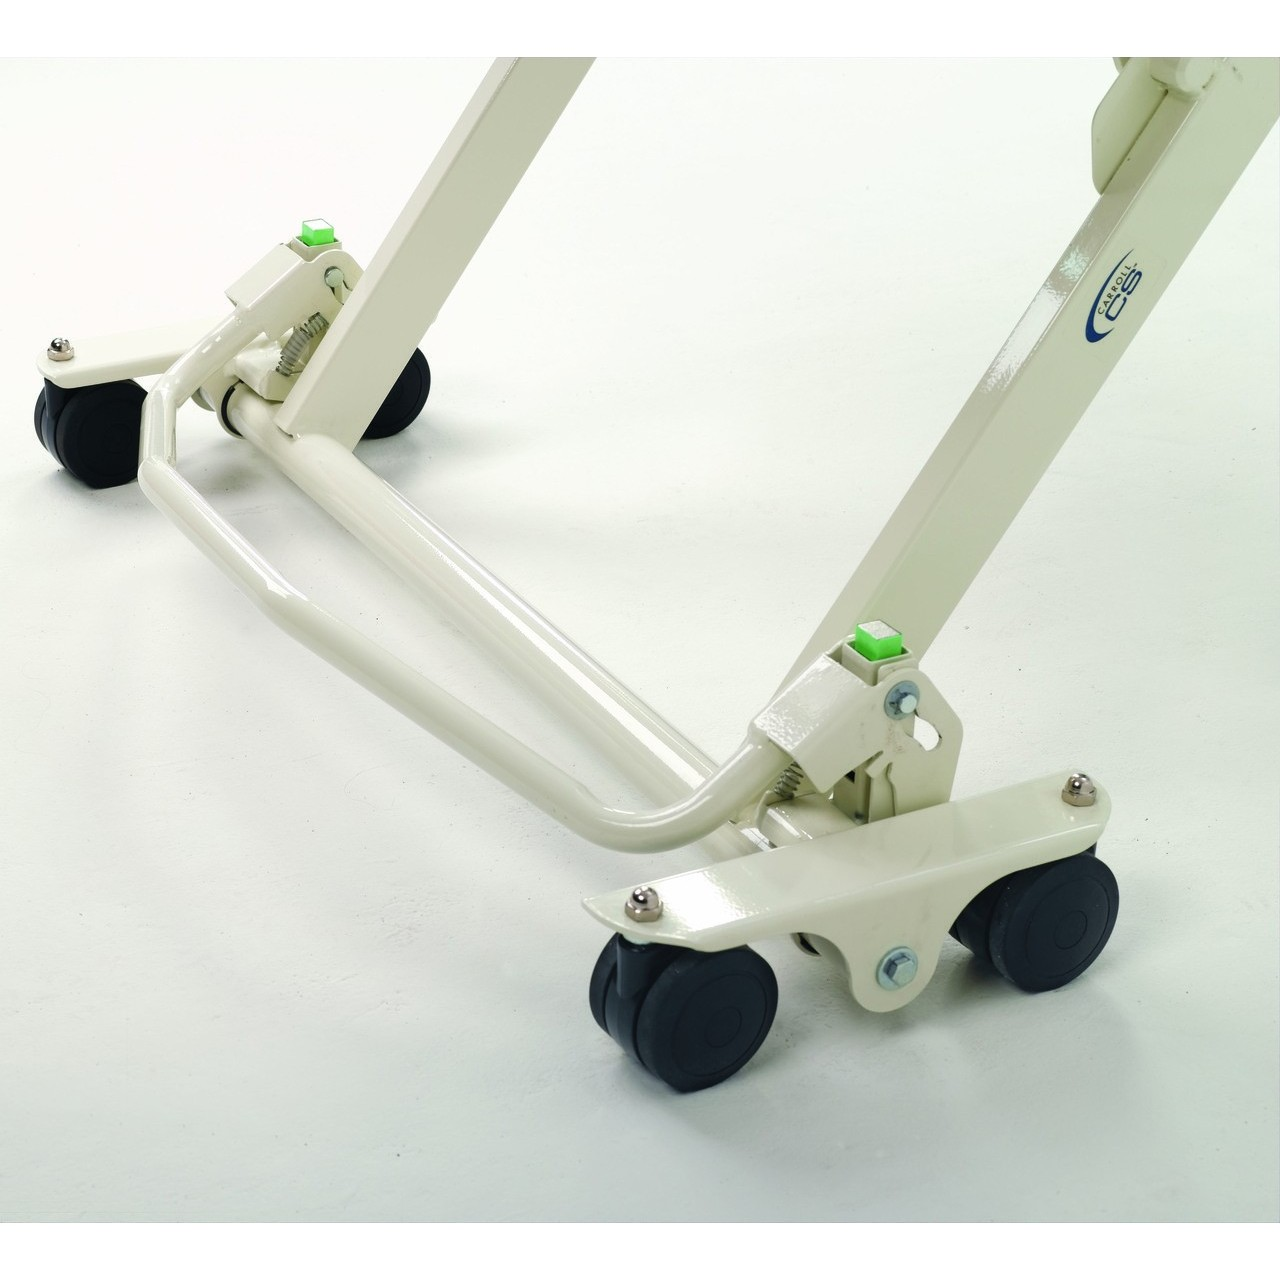 Invacare Carroll CS7 Hi-Low Hospital Bed Wheels